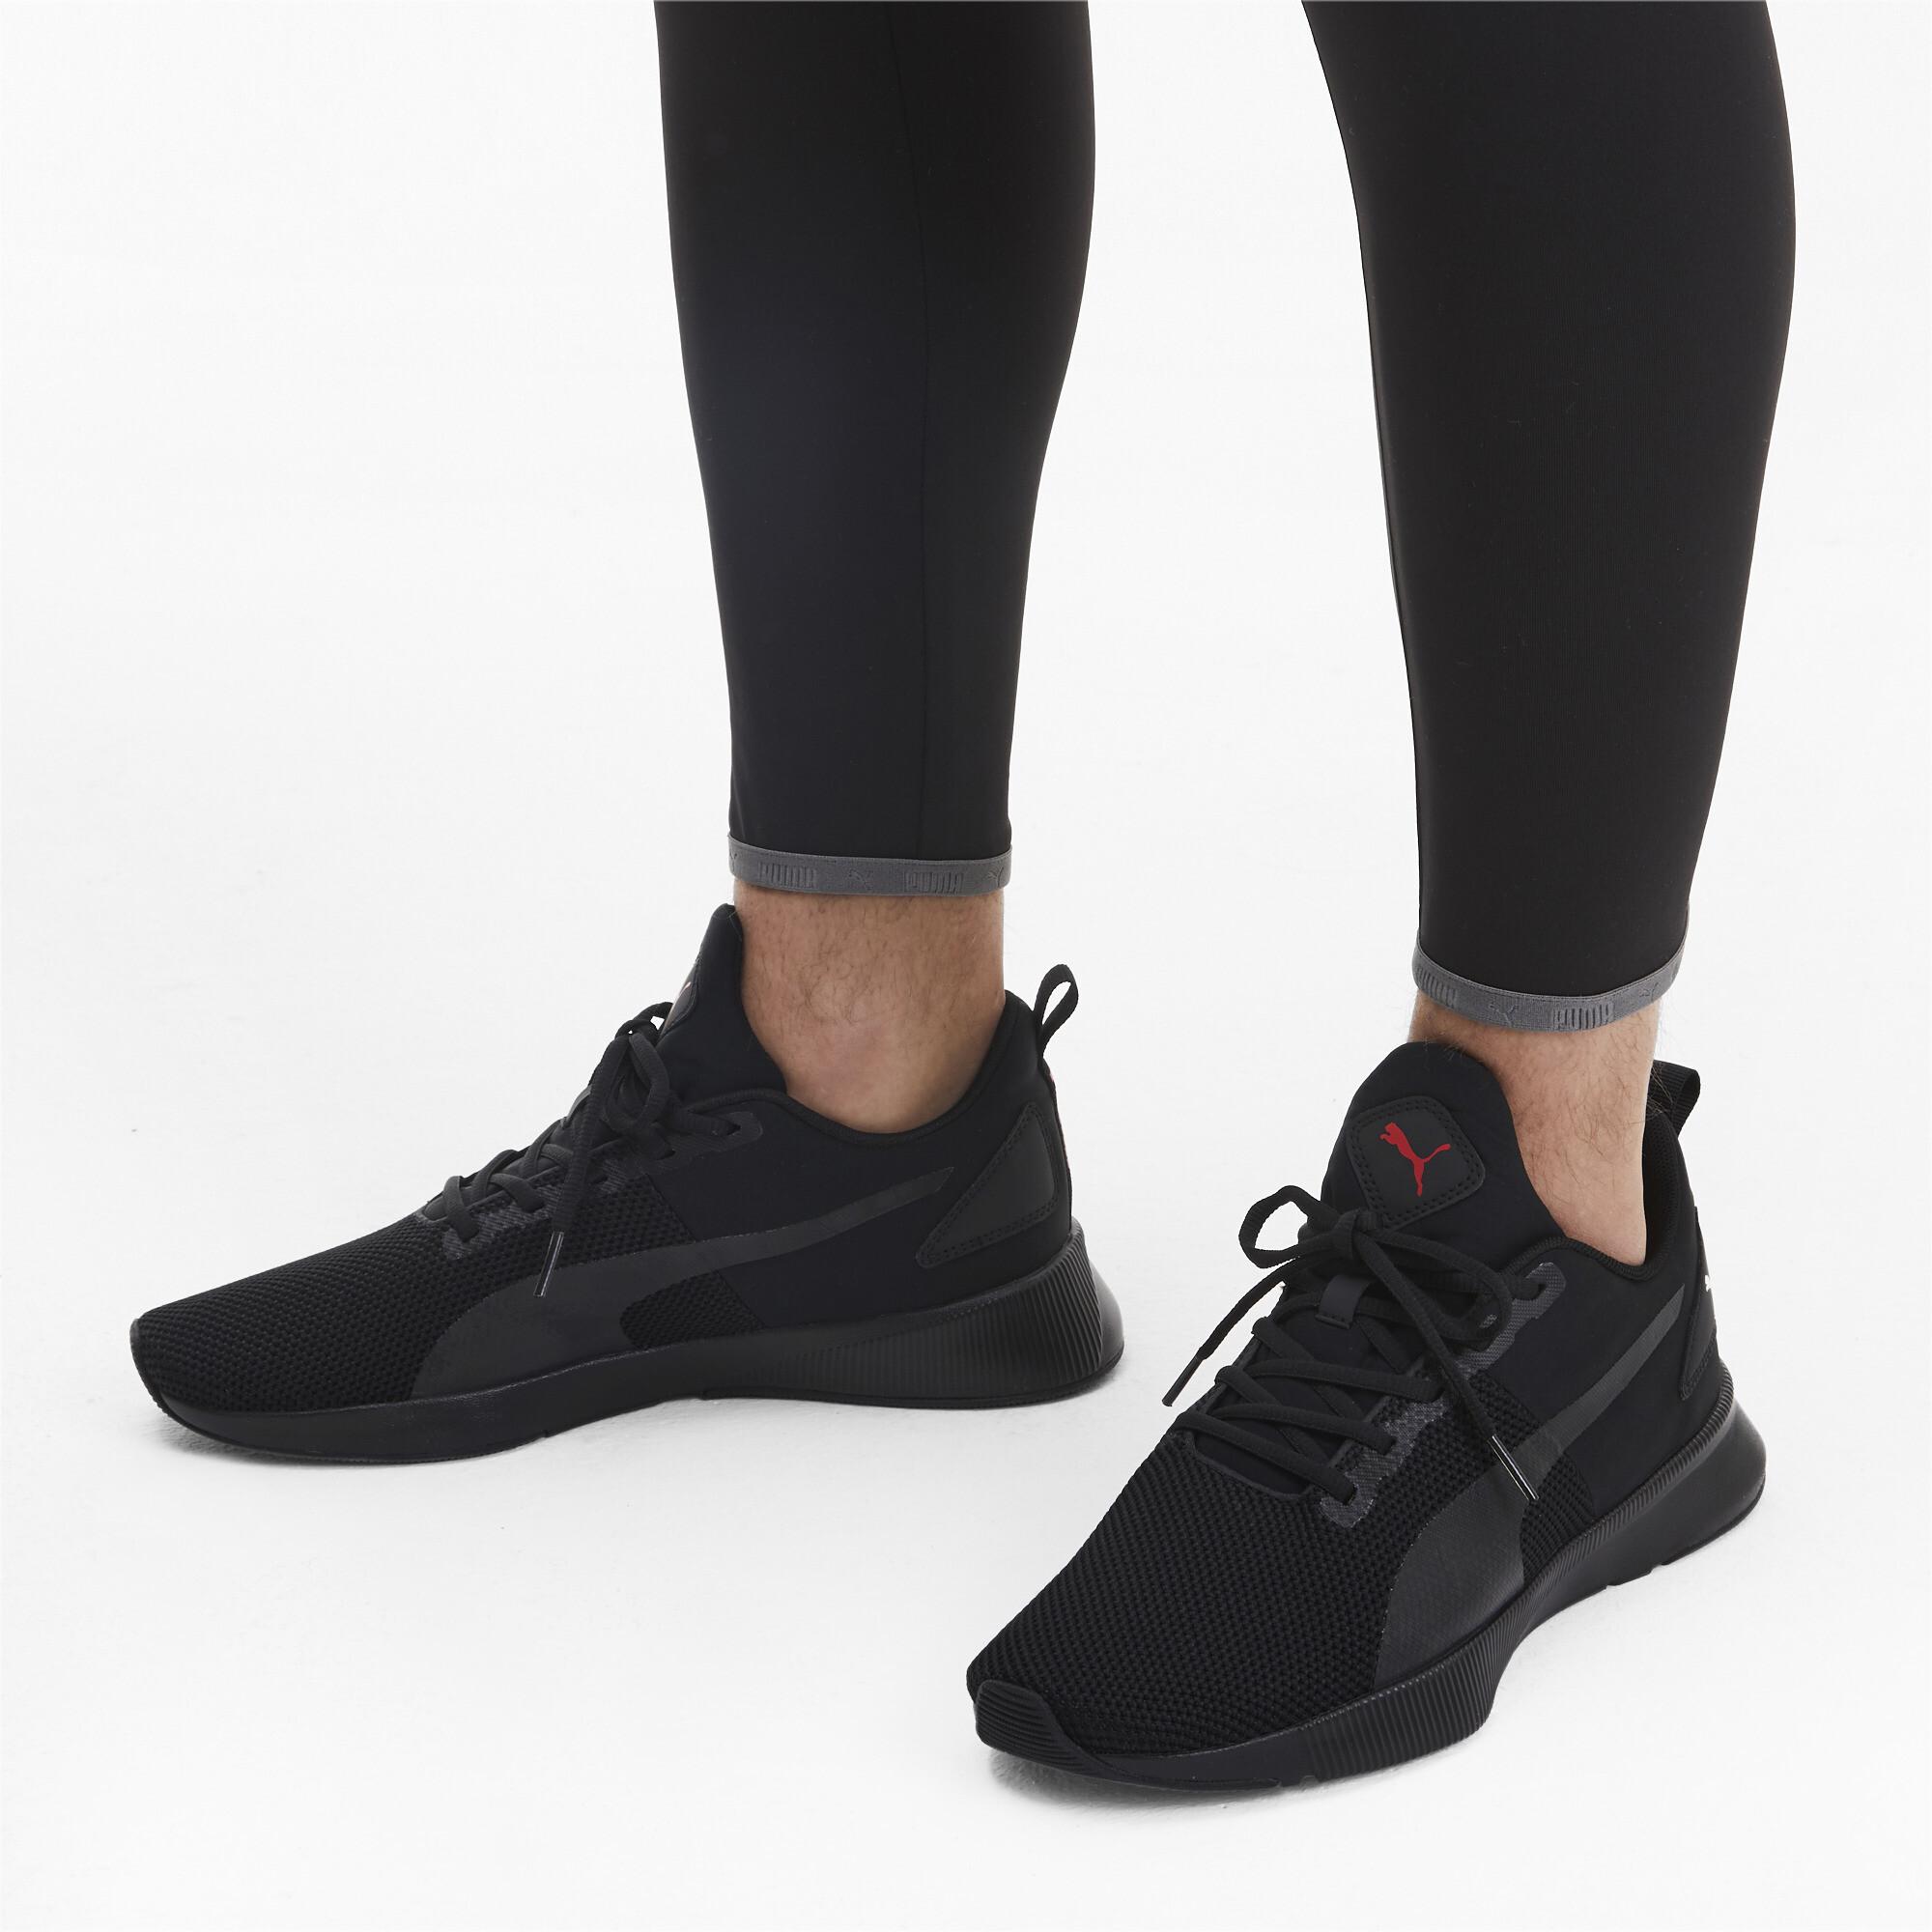 PUMA-Flyer-Runner-Running-Shoes-Mens-Shoe-Running thumbnail 29